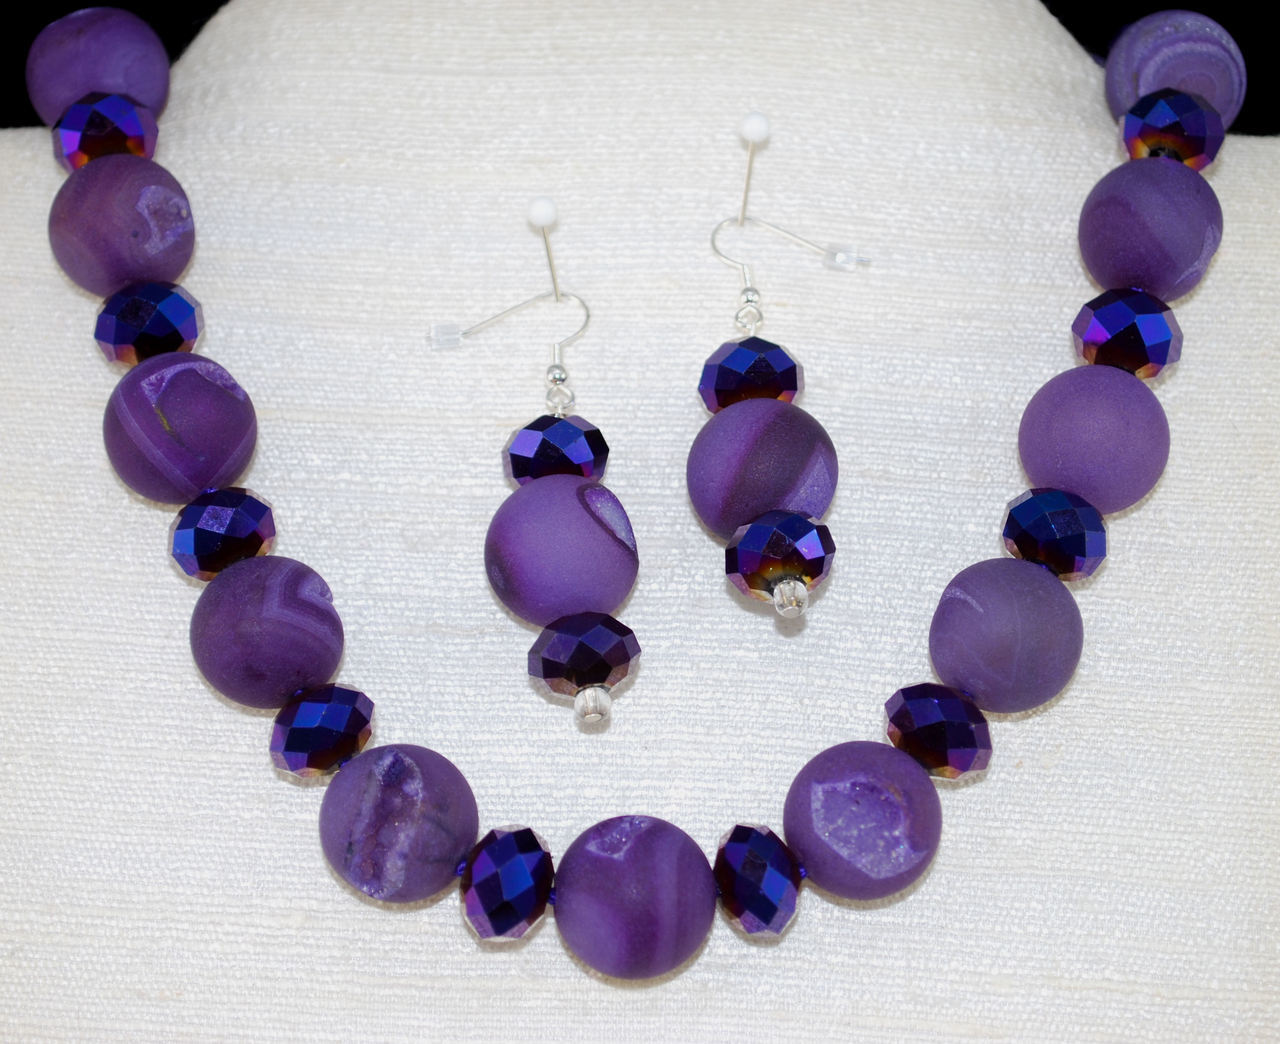 Enchanting Jewelry Creations image 20